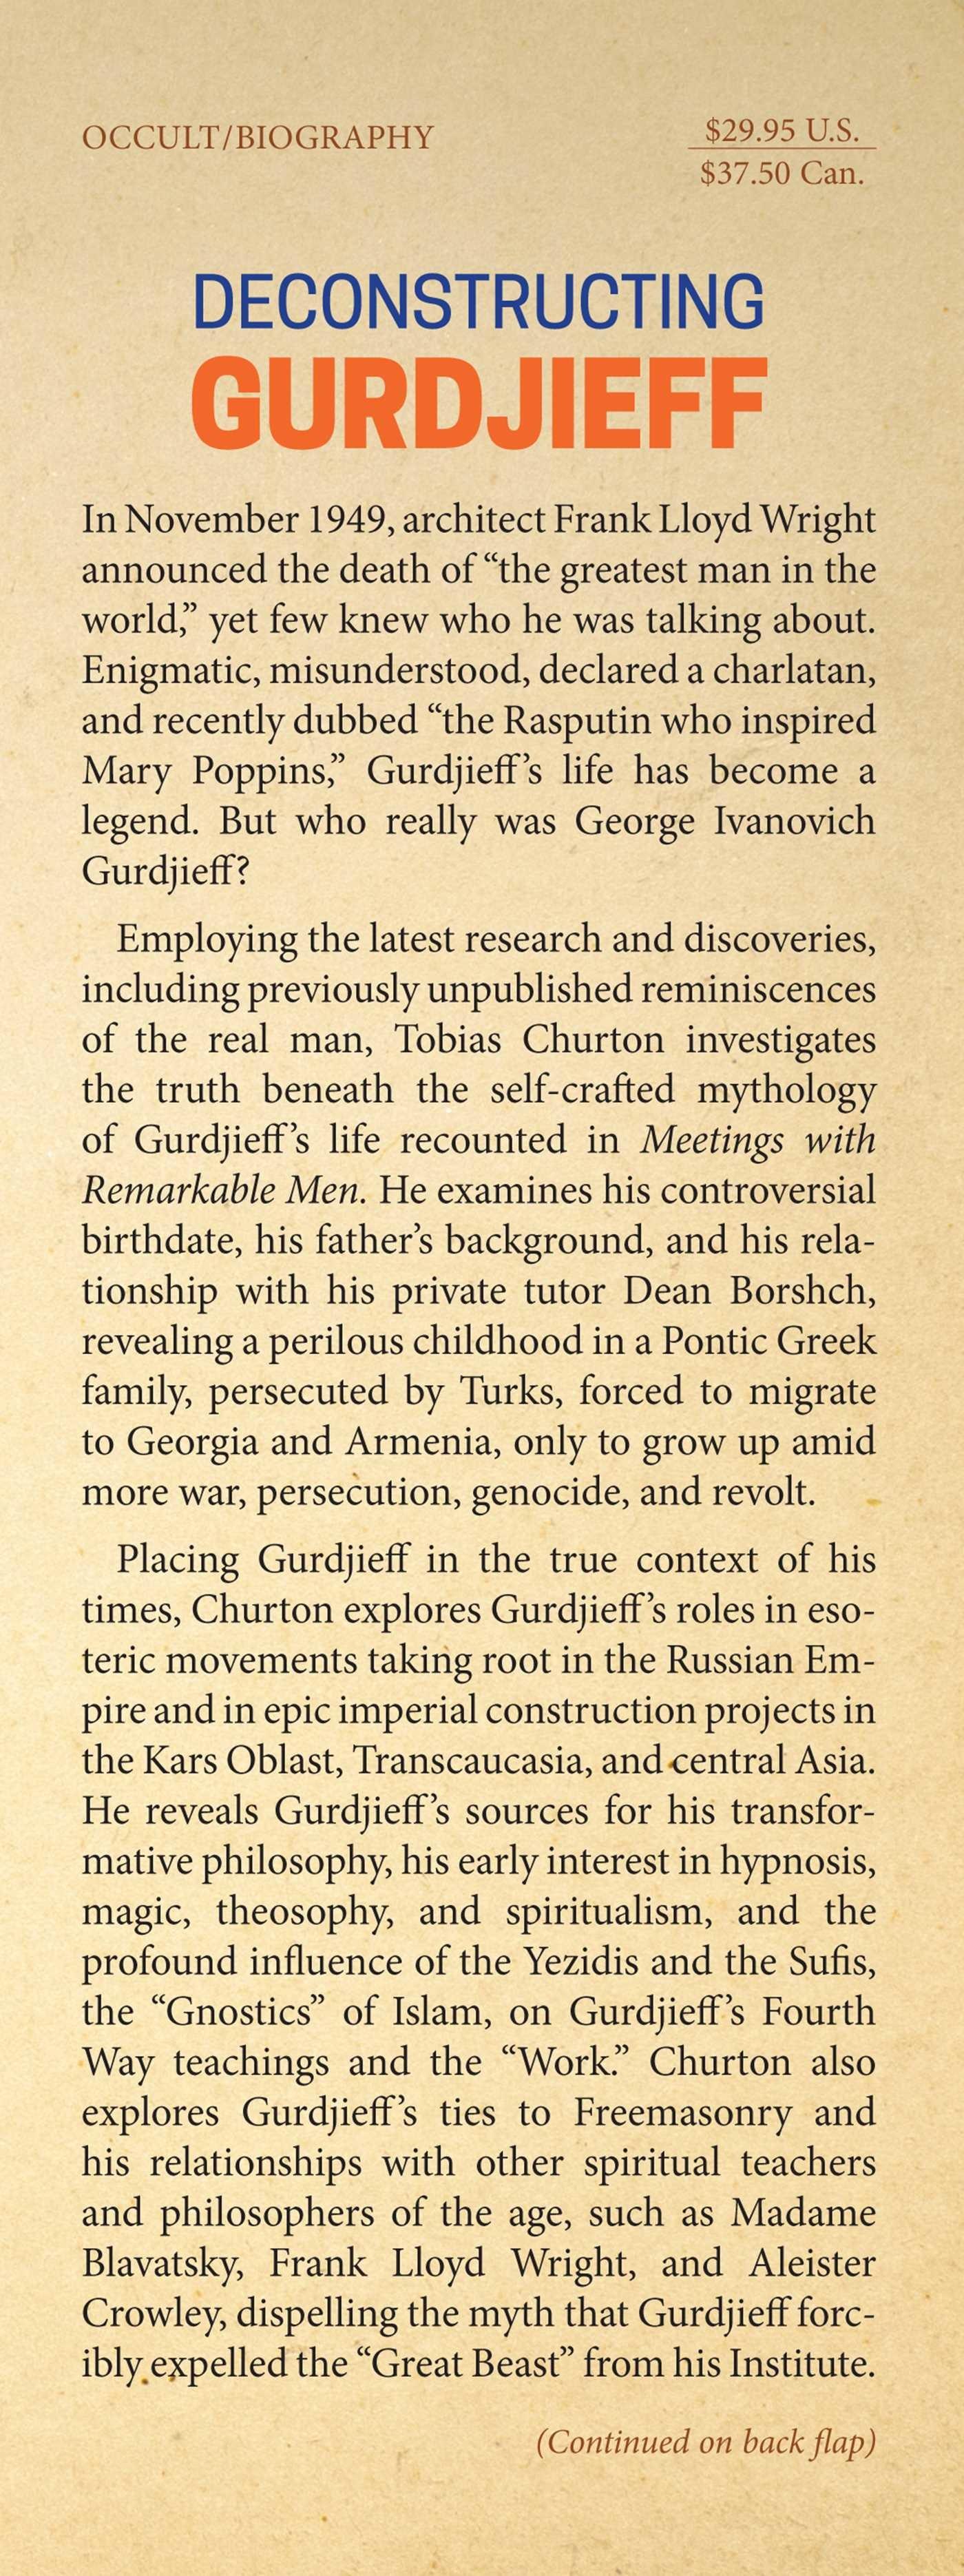 Deconstructing gurdjieff 9781620556382.in01